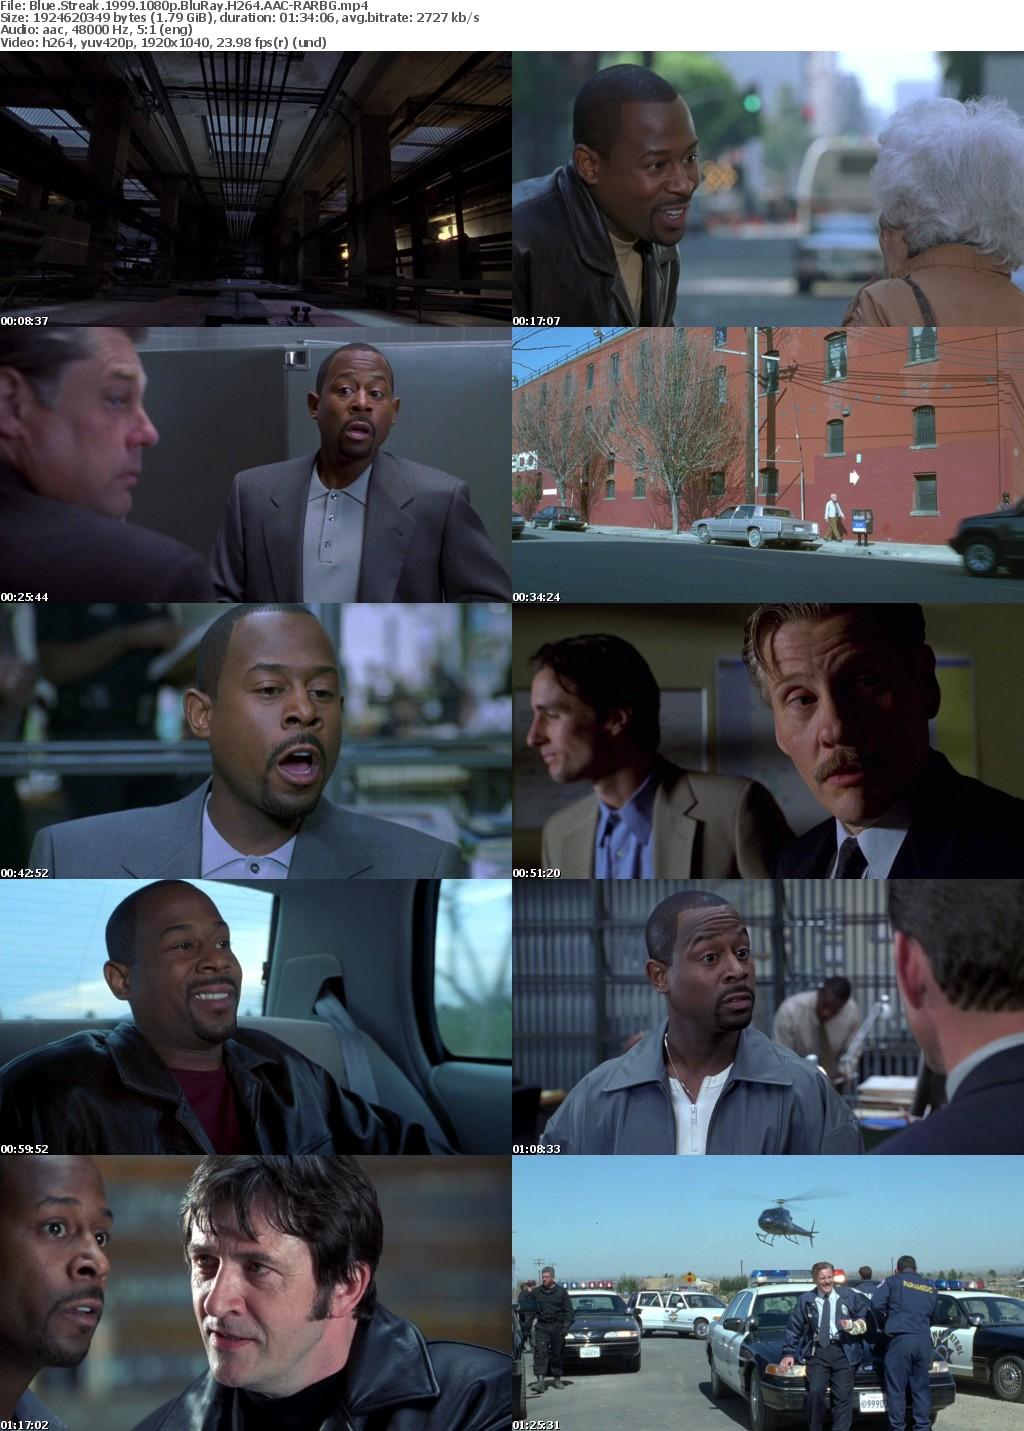 Blue Streak (1999) 1080p BluRay H264 AAC-RARBG